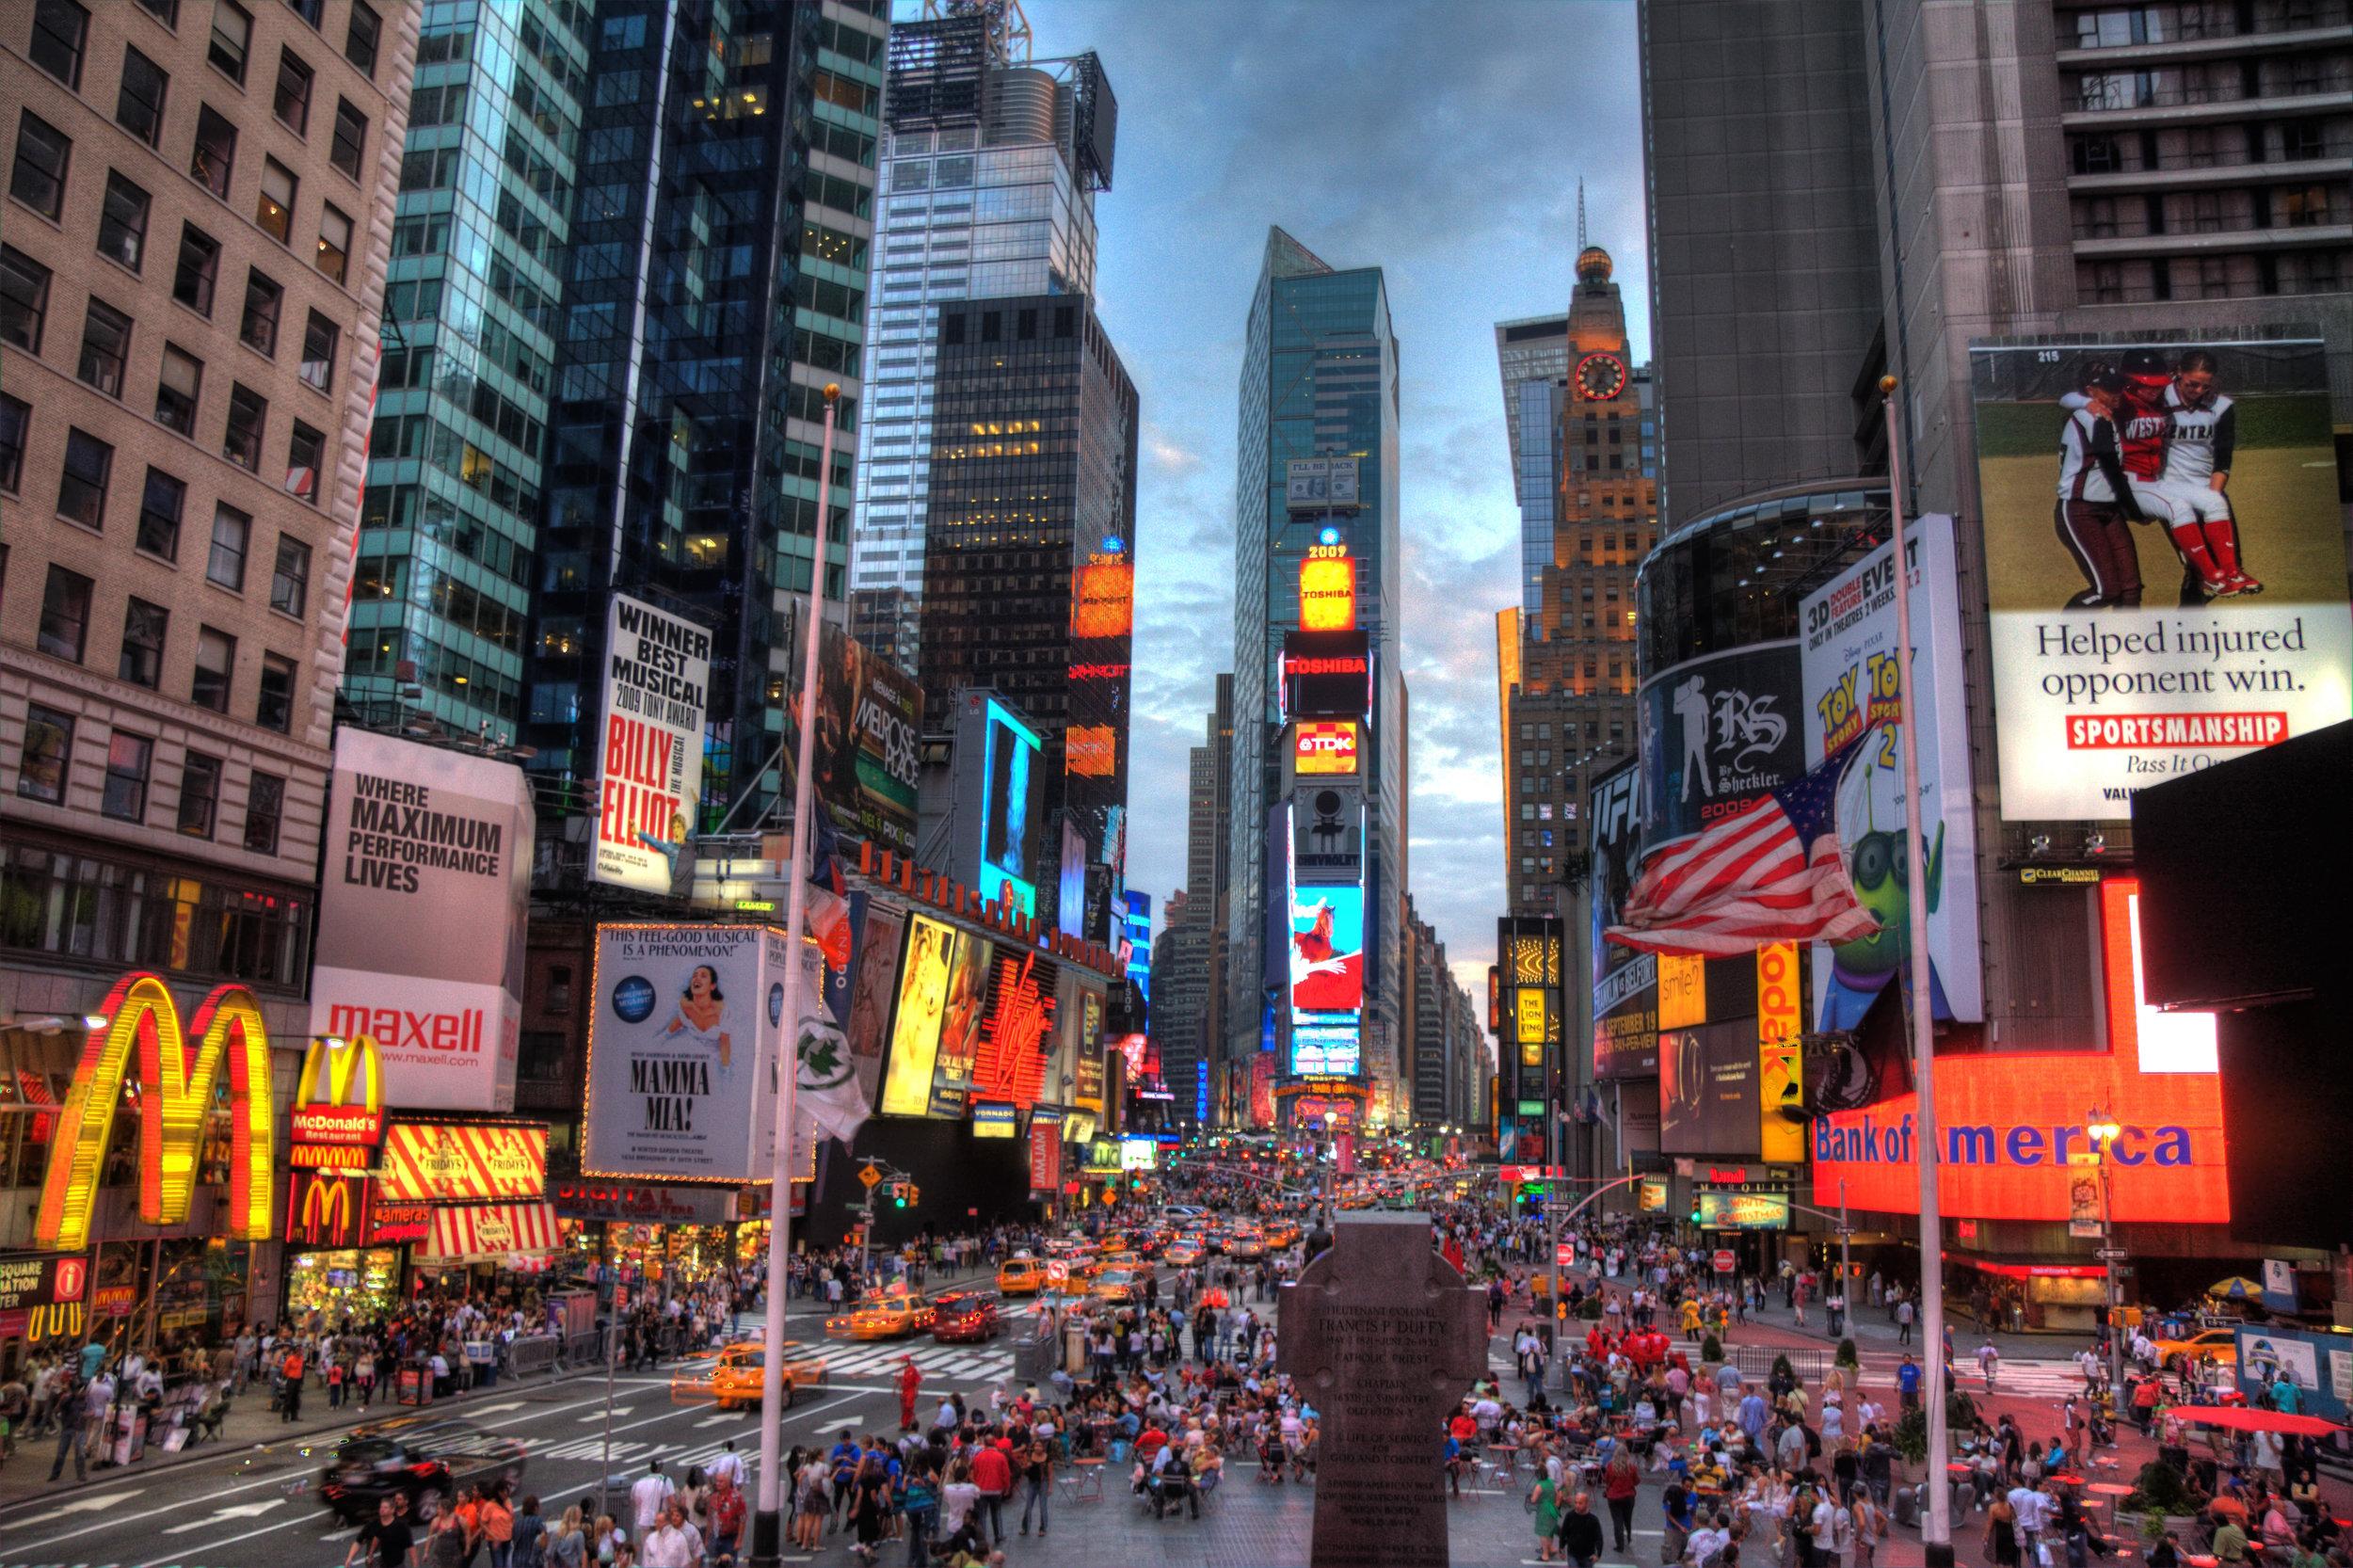 NEW YORK CITY, NEW YORK - SEASON 3